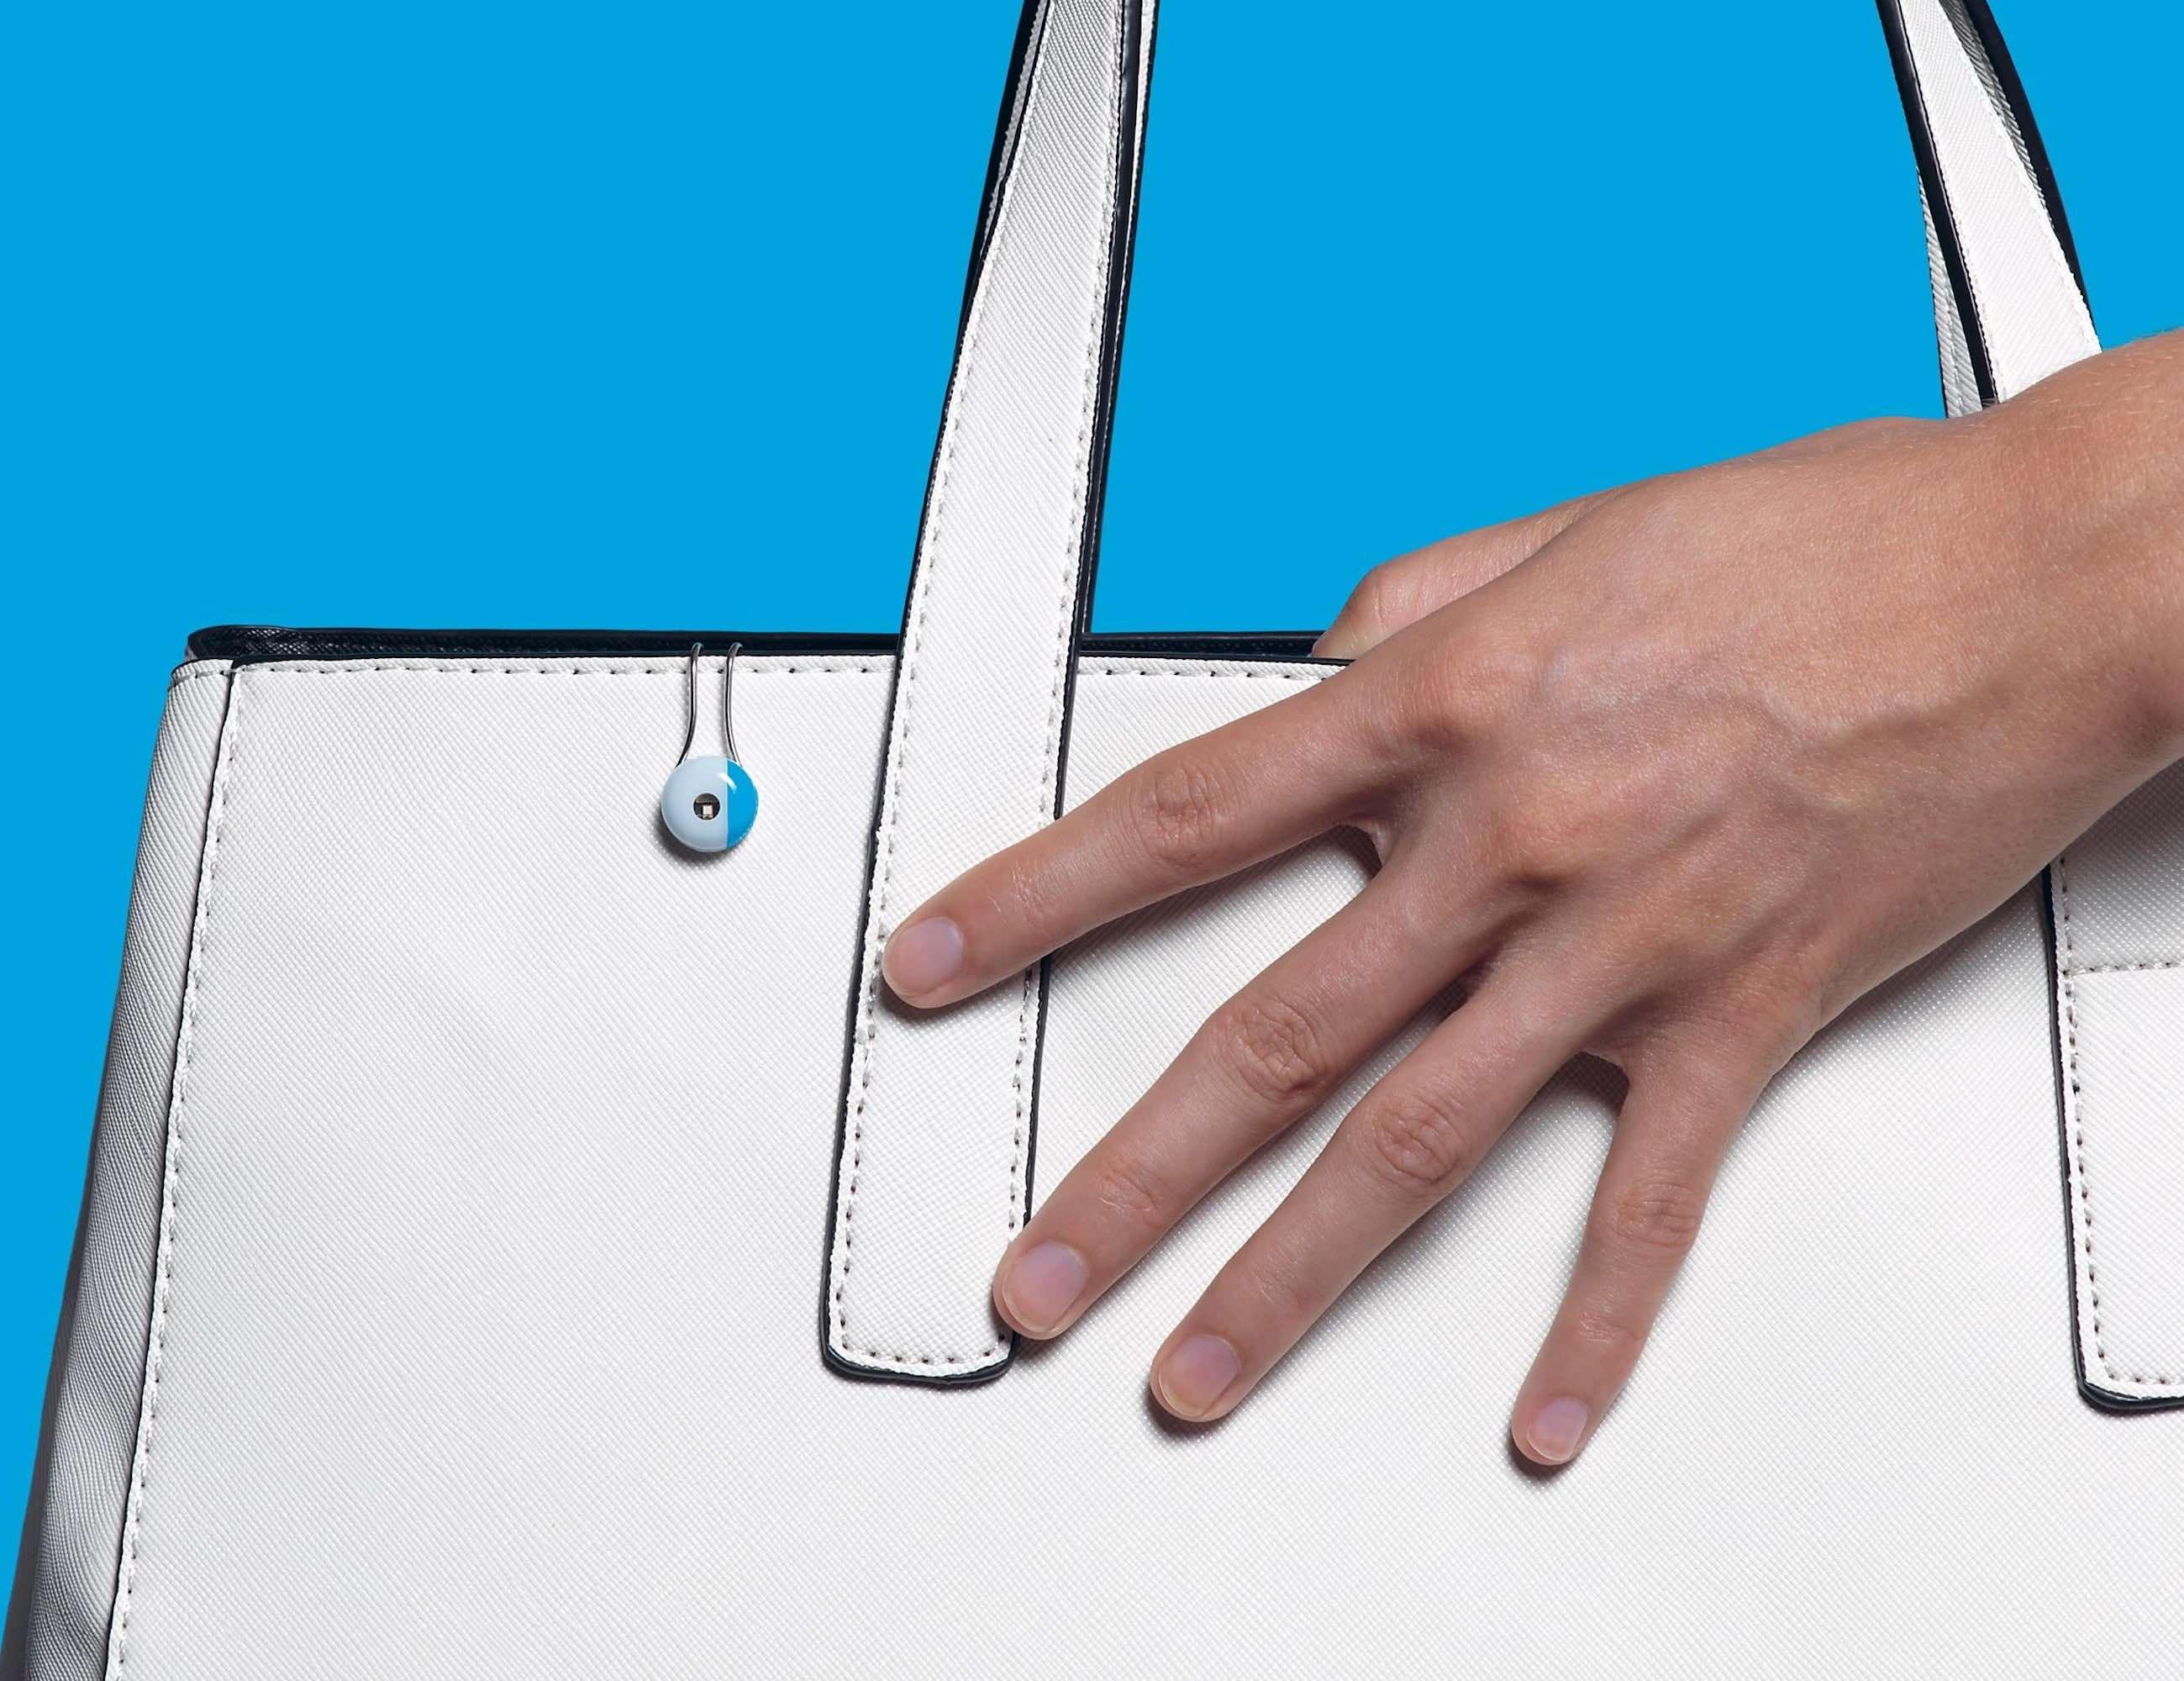 La Roche-Posay My Skin Track UV Sensor